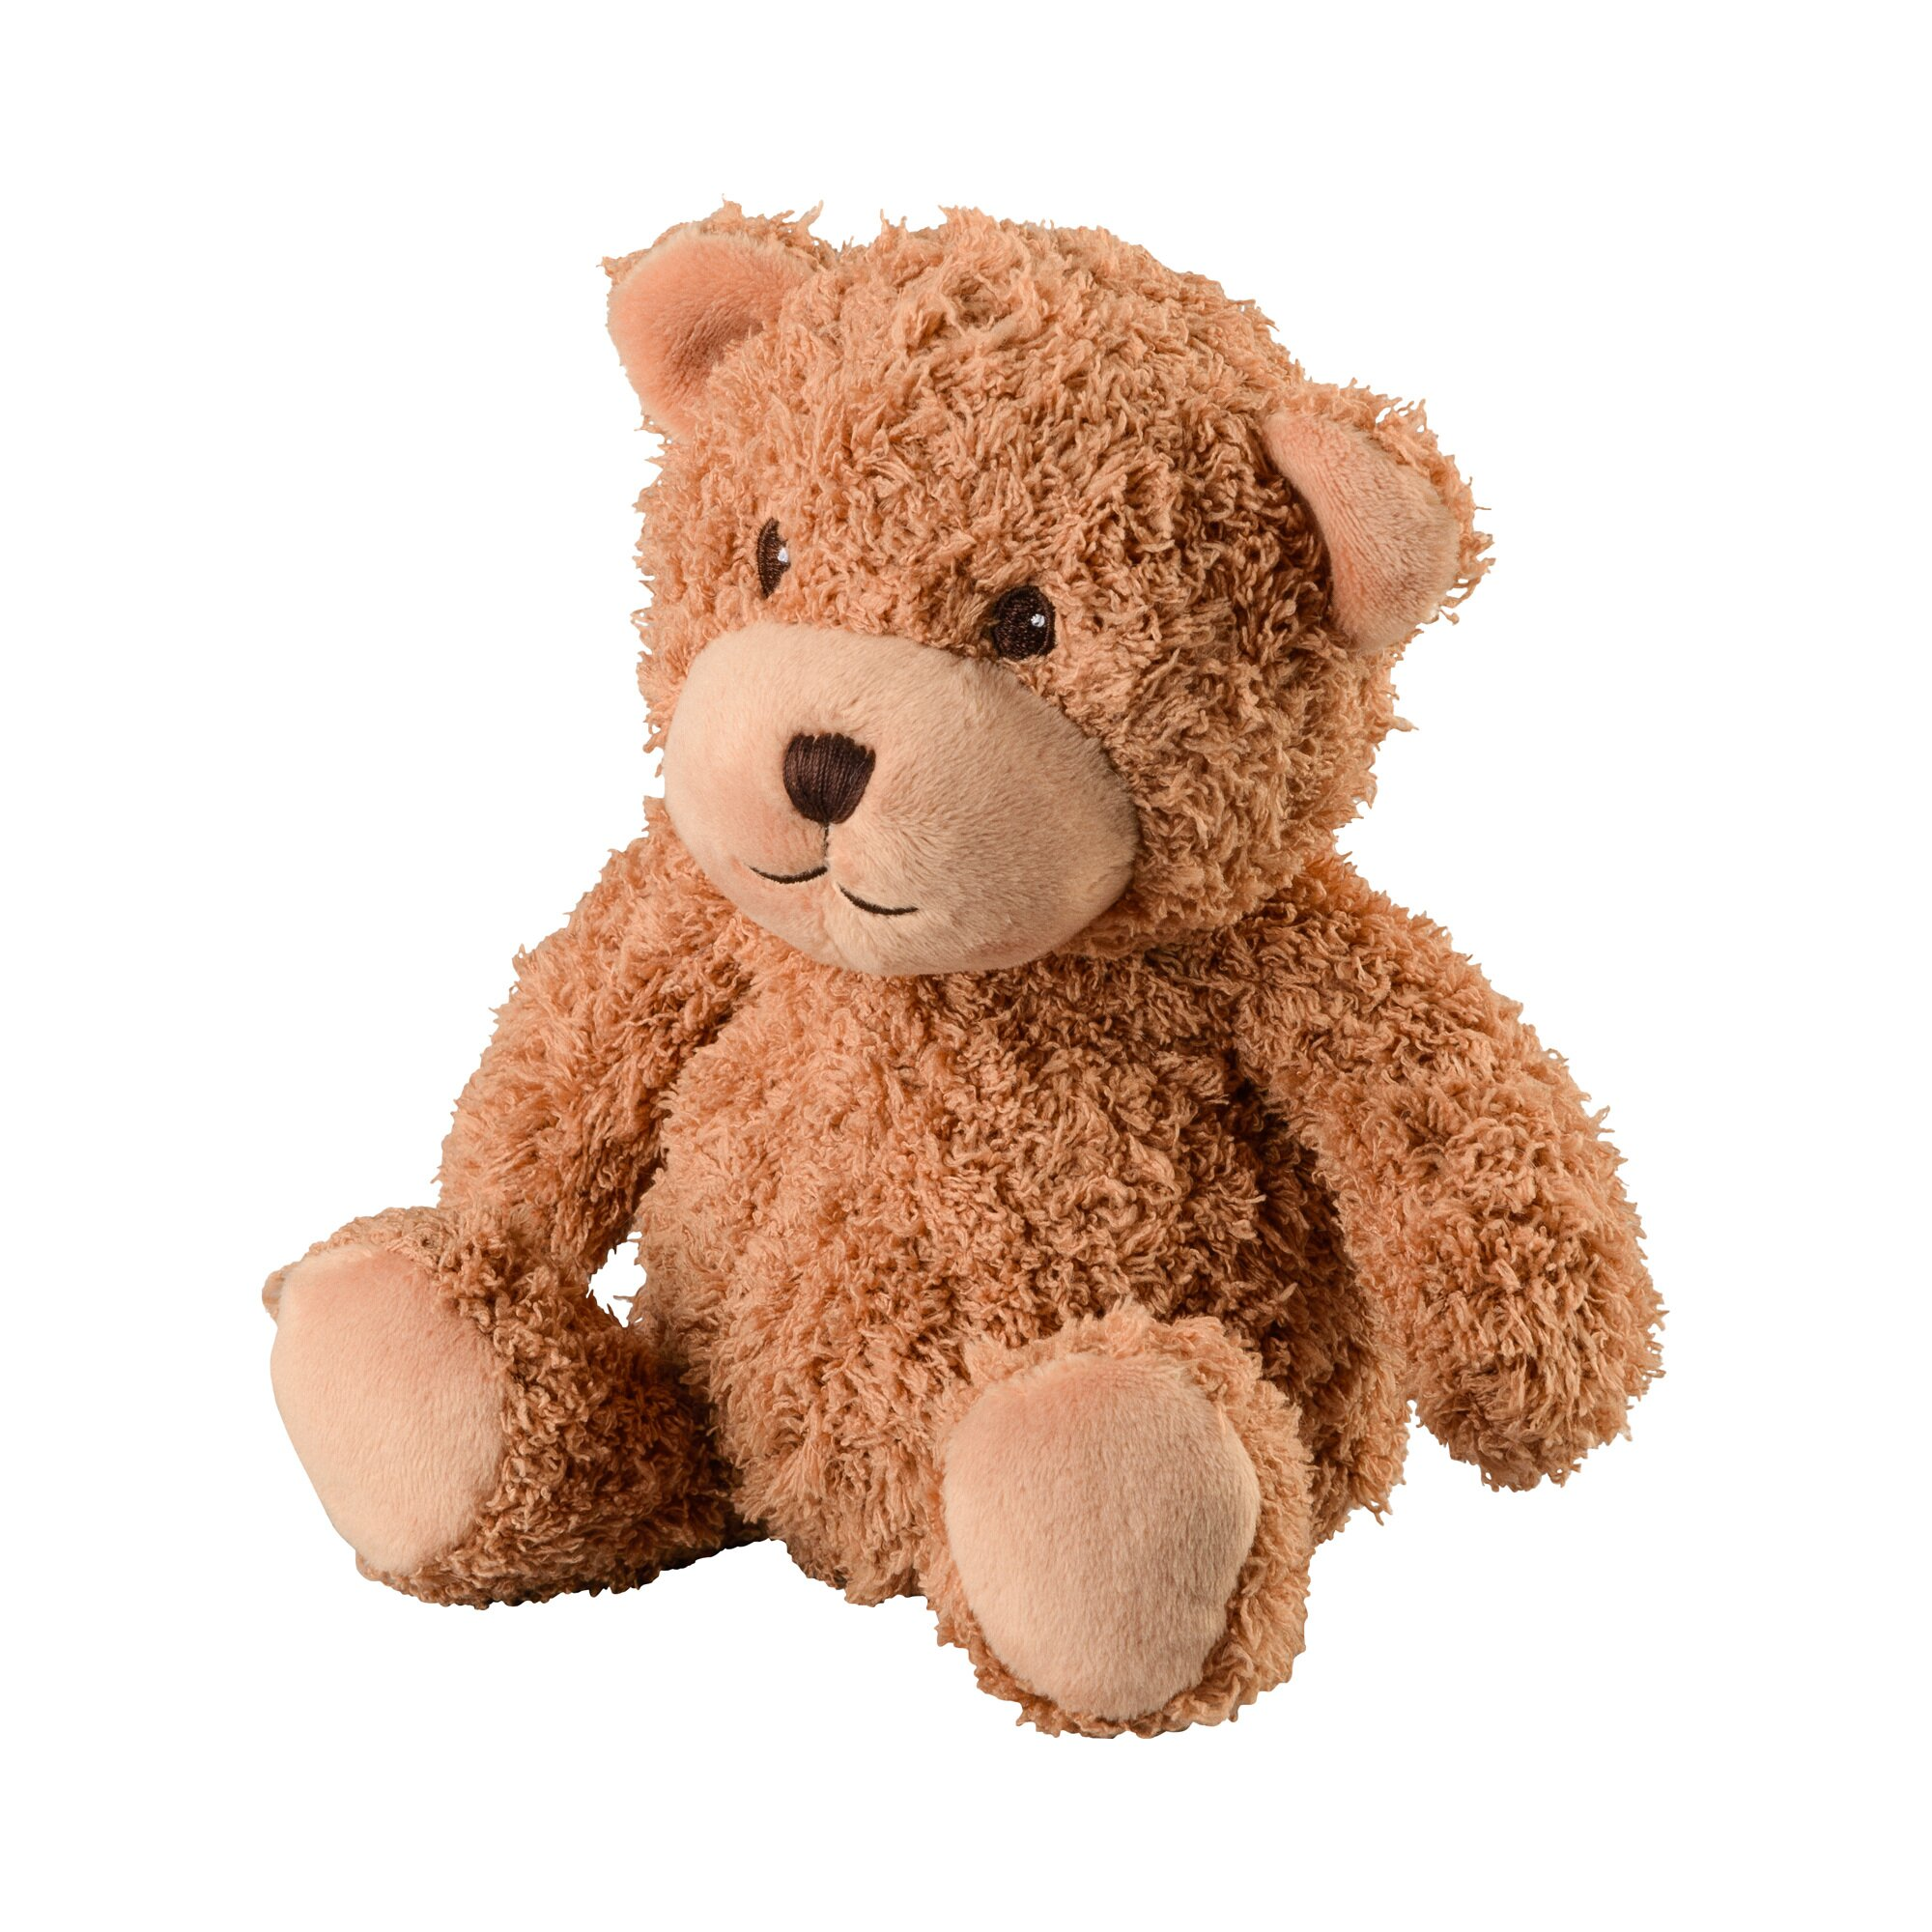 warmies-warmekissen-mit-lavendel-kornfullung-minis-teddy